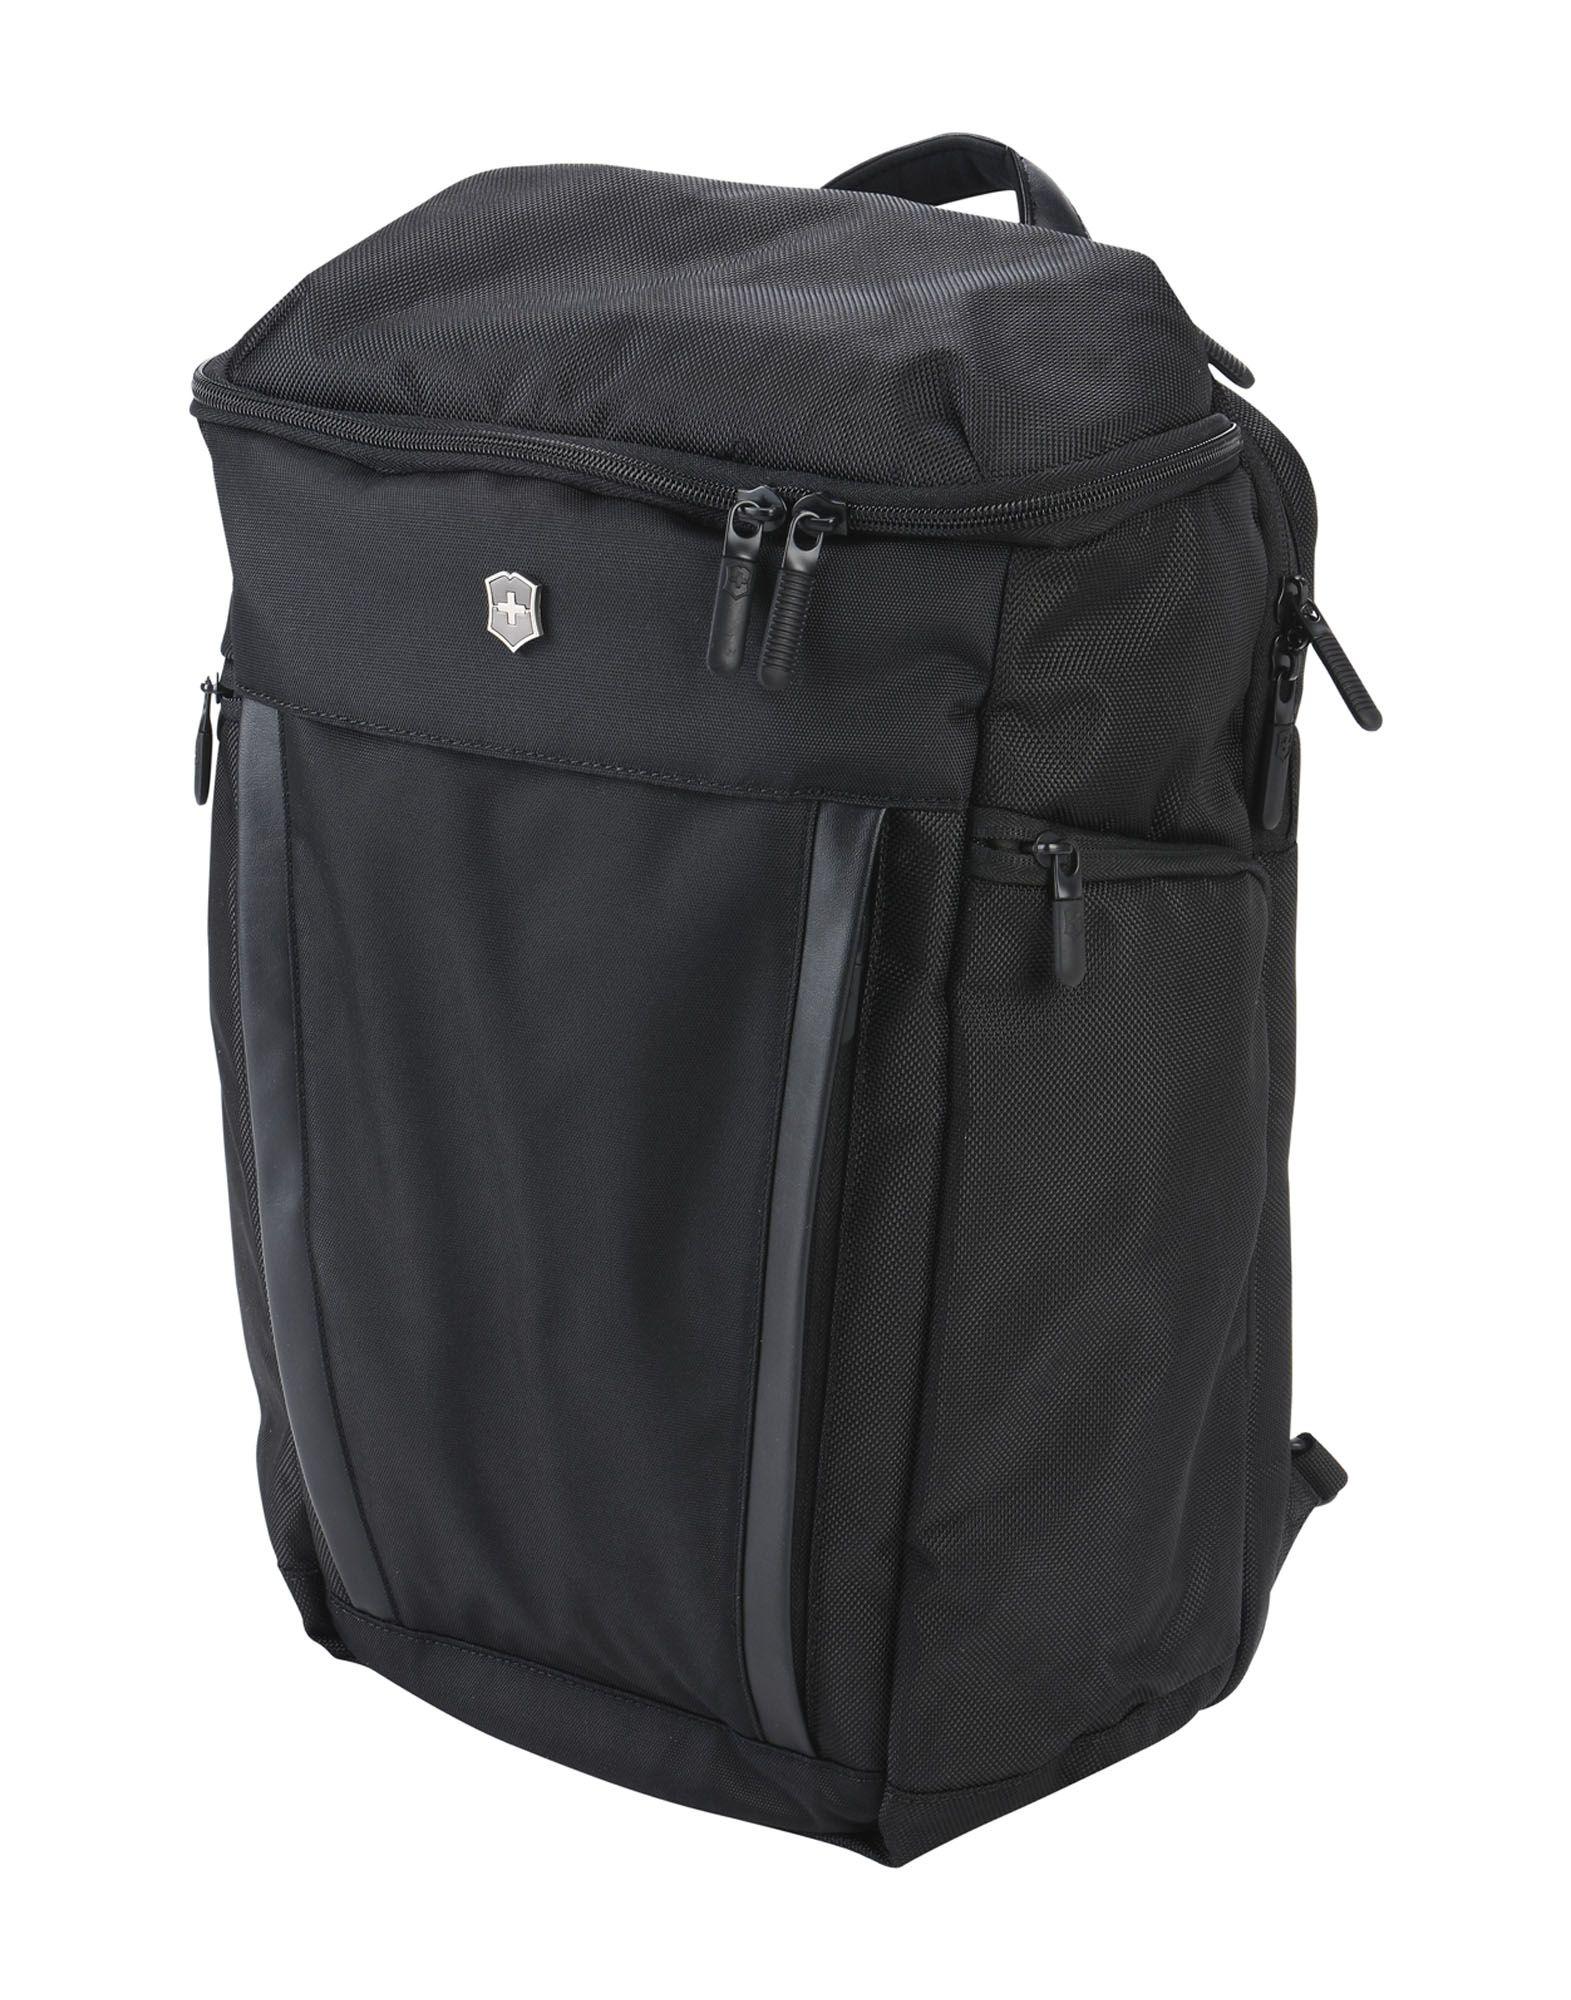 Zaini & Marsupi Victorinox Altmont Professional Deluxe Fliptop Laptop Backpack - Uomo - Acquista online su